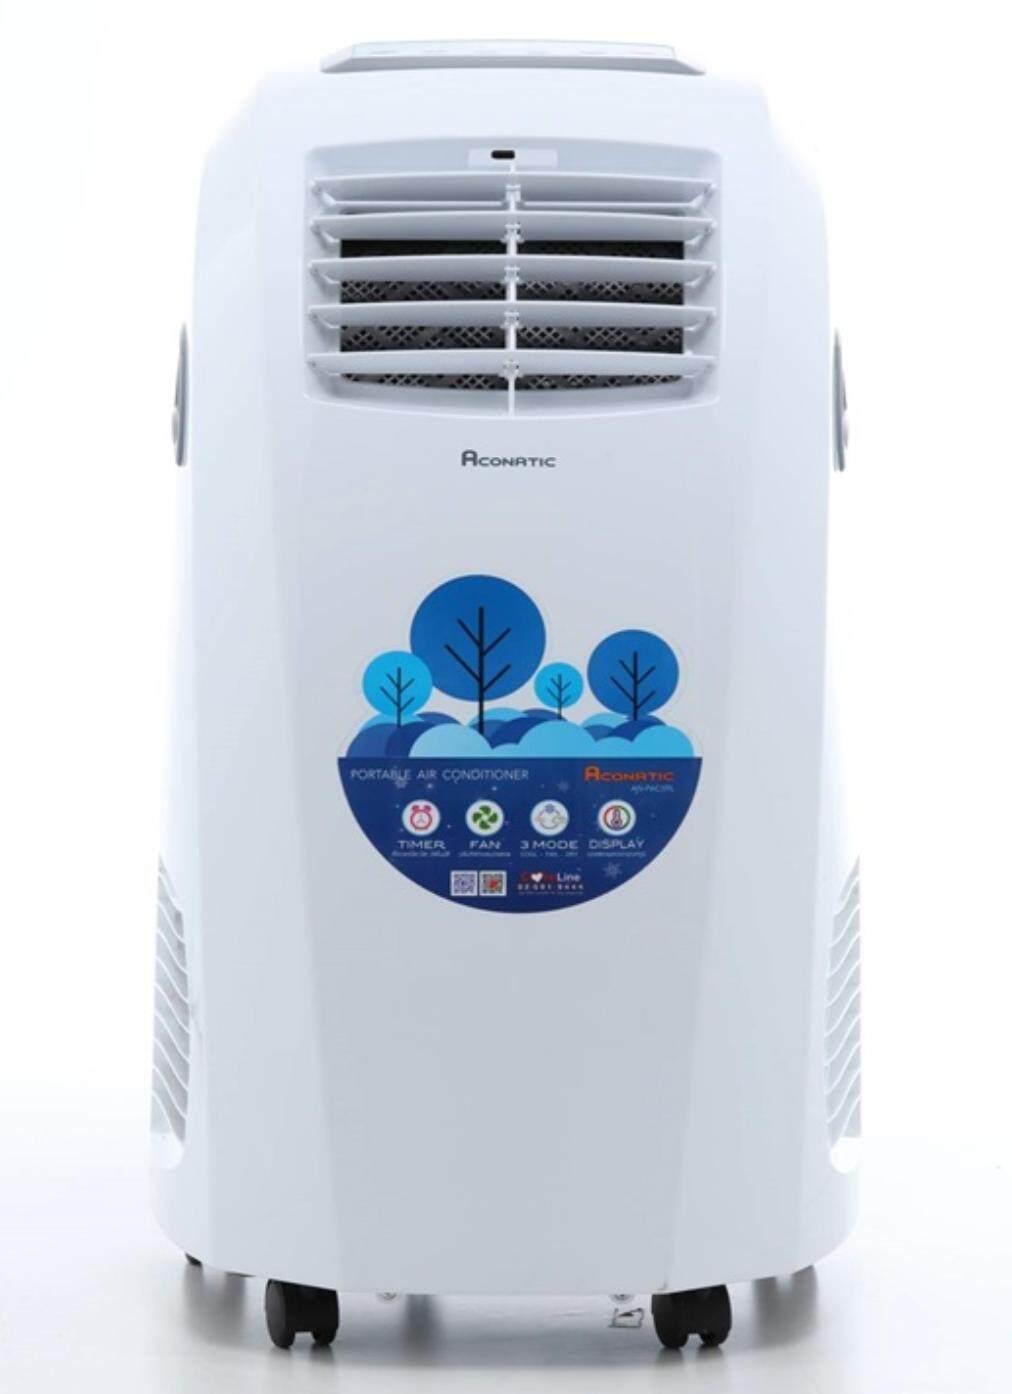 [Aconatic] Portable Air แอร์เคลื่อนที่ ขนาด 9000 BTU รุ่น AN-PAC09L